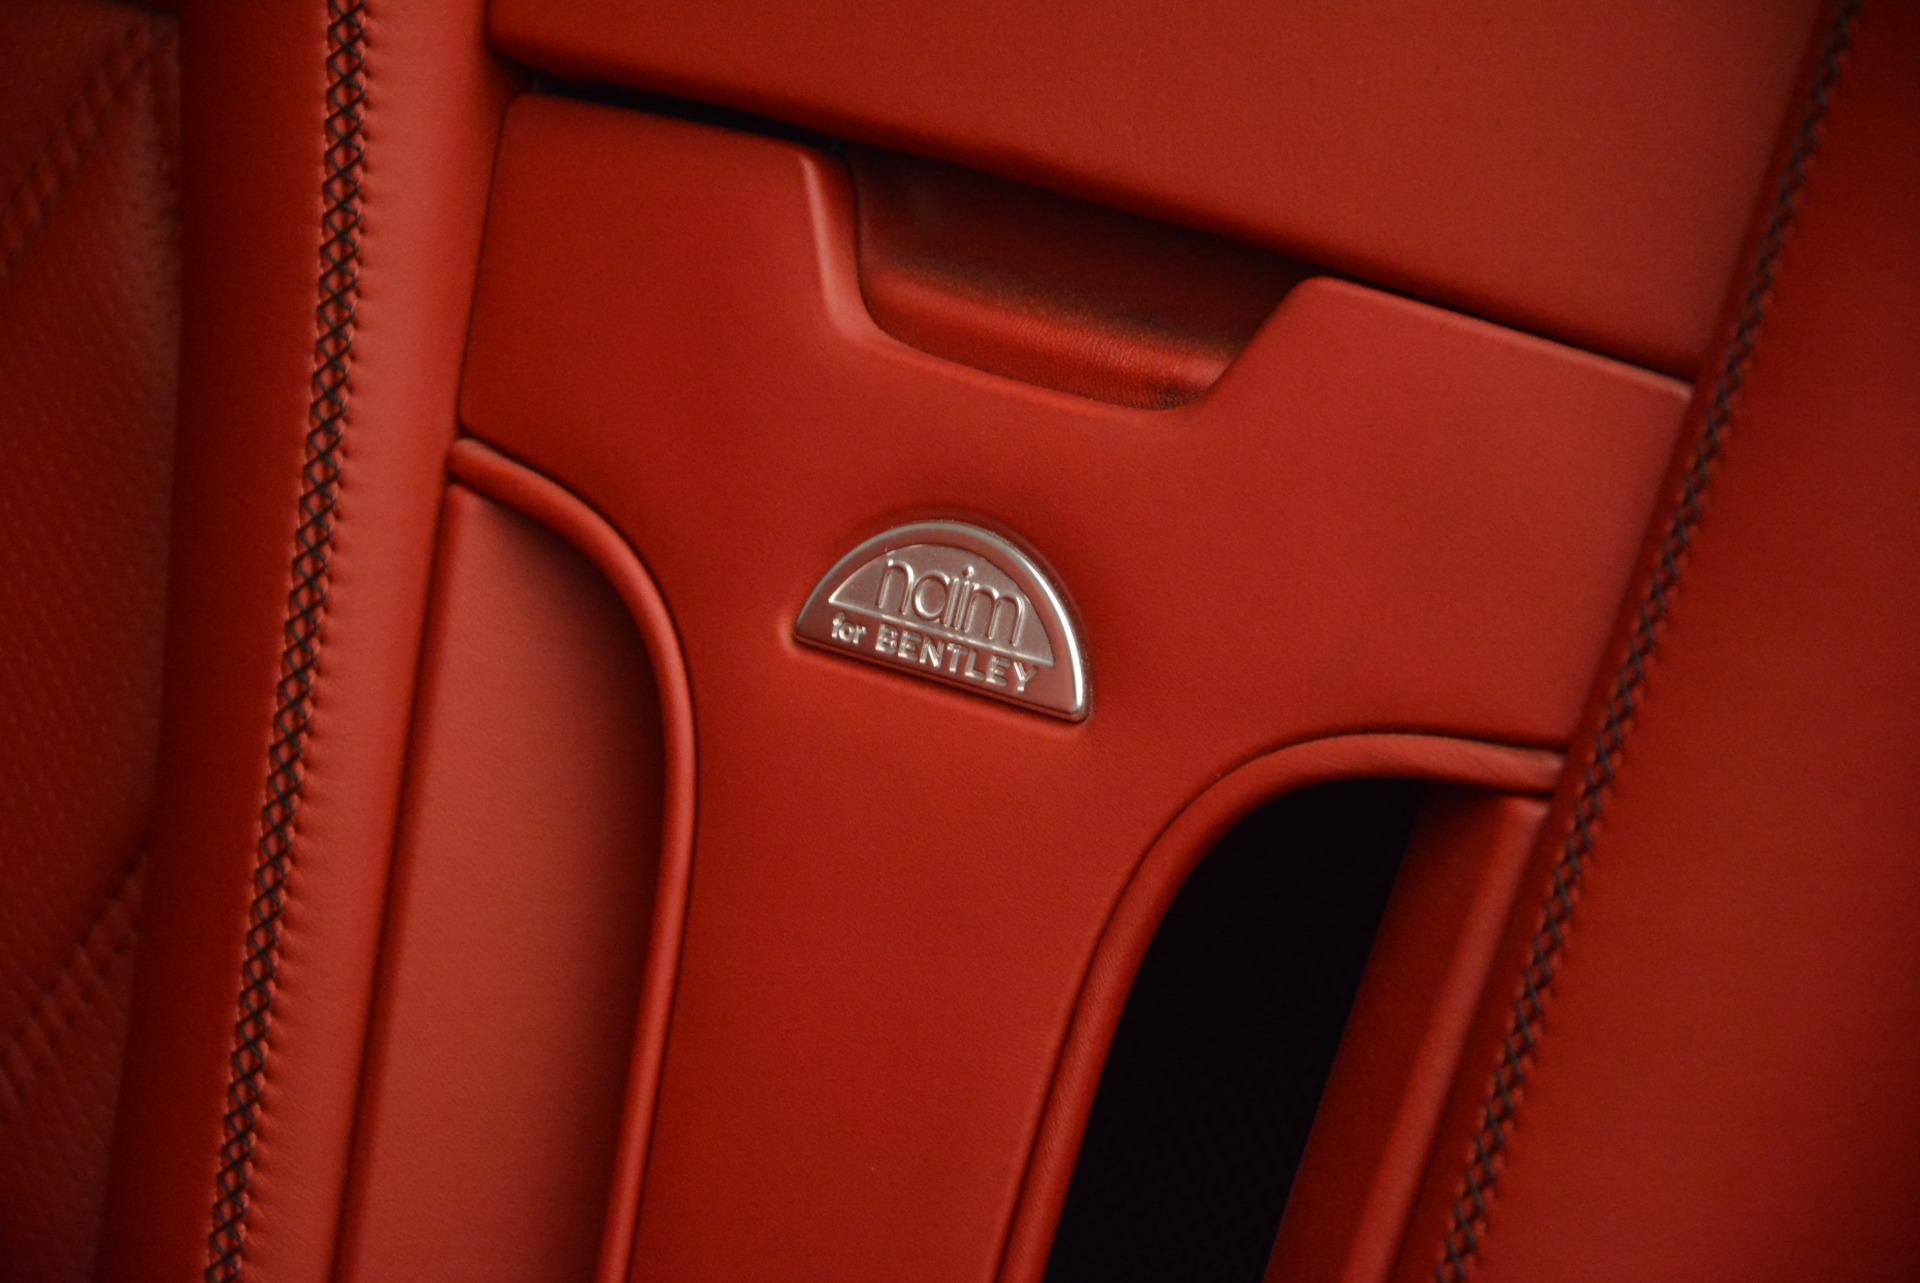 Used 2010 Bentley Continental GT Speed For Sale In Westport, CT 1298_p38